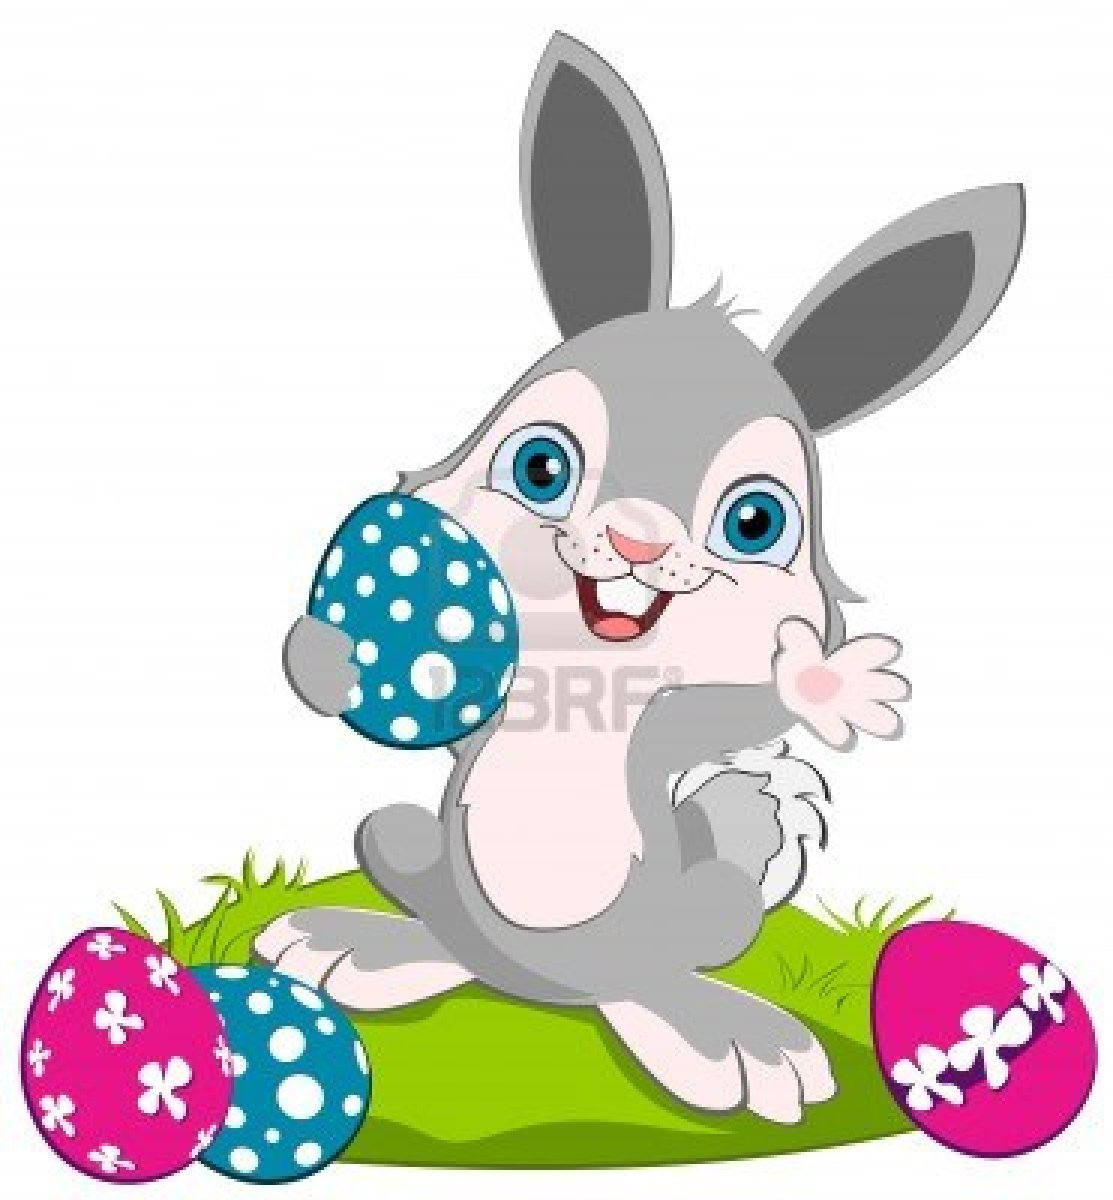 Animated Easter Bunny | www.pixshark.com - Images ...